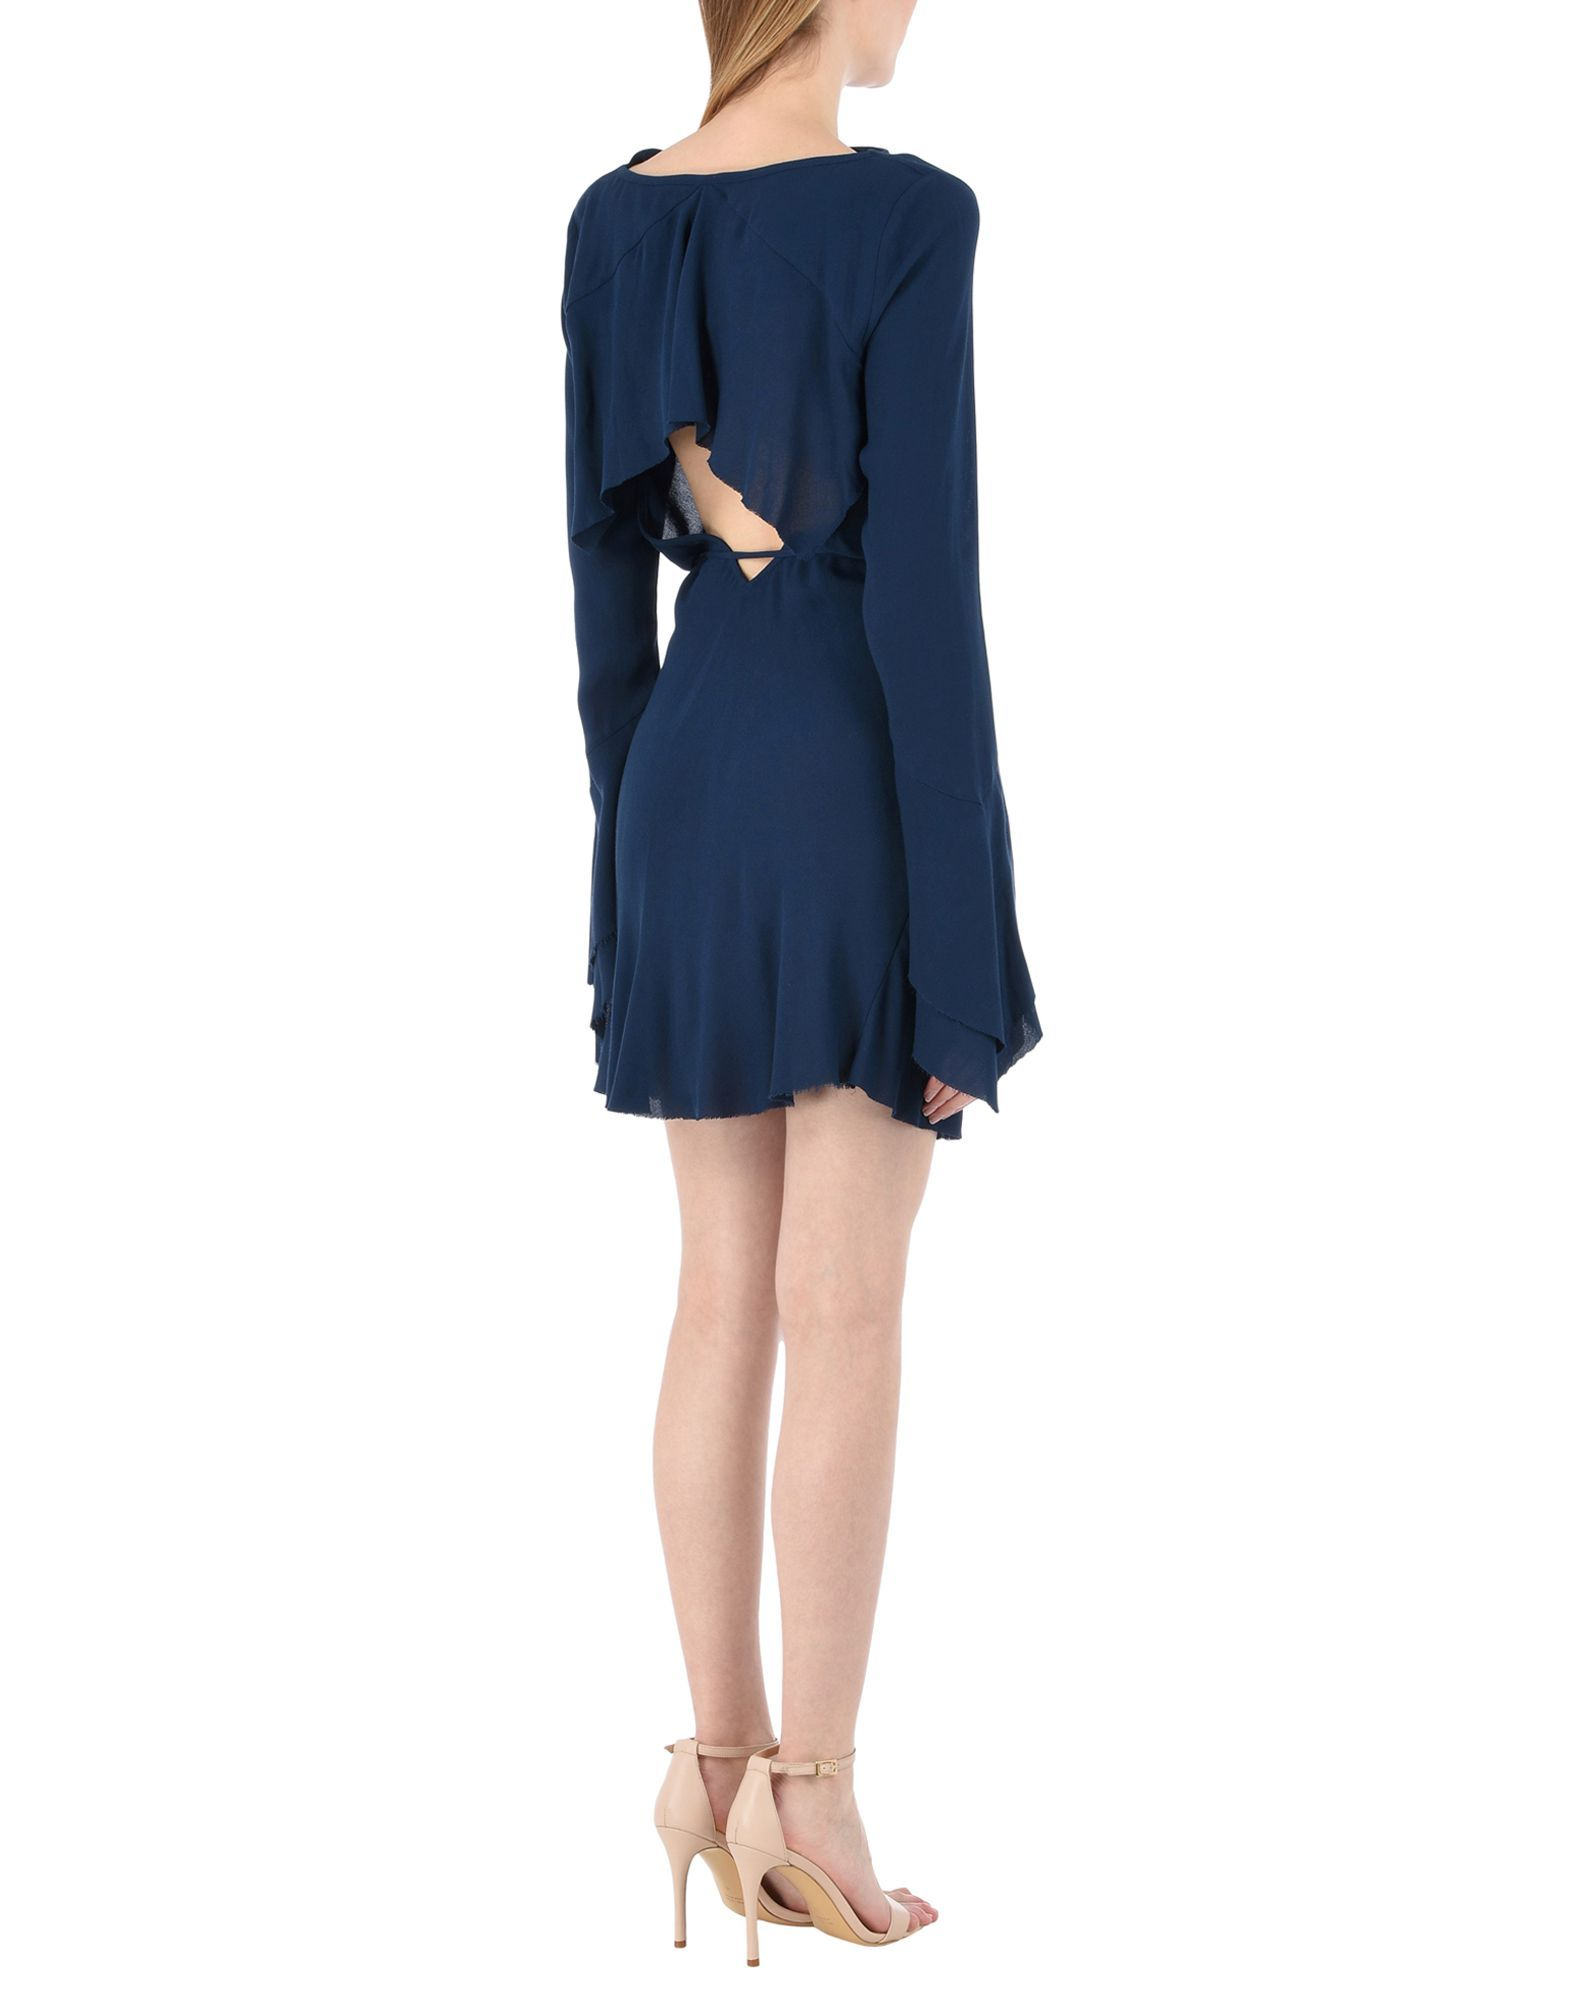 Bec & Bridge Dark Blue Belted Dress